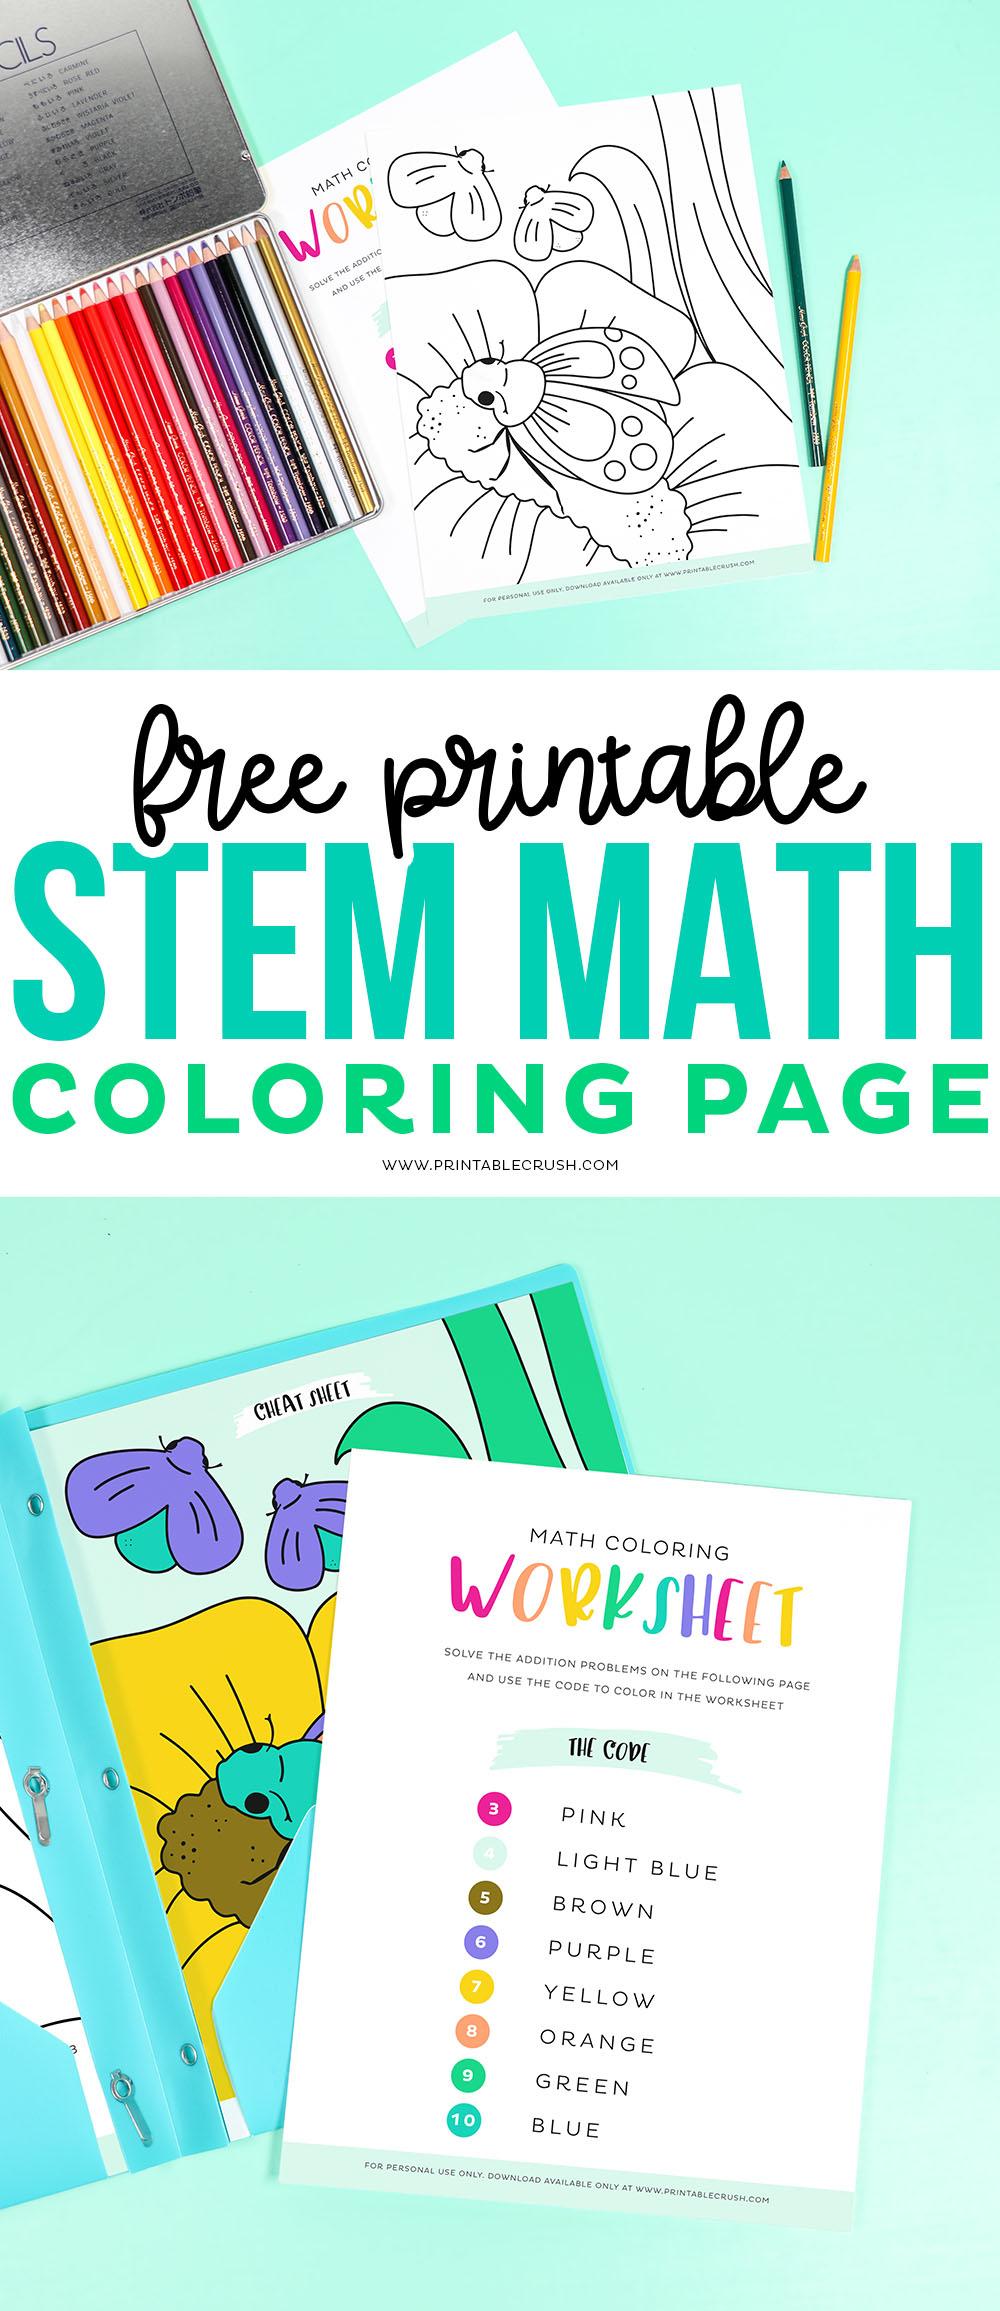 STEM Math Coloring Worksheet – Free Printable via @printablecrush